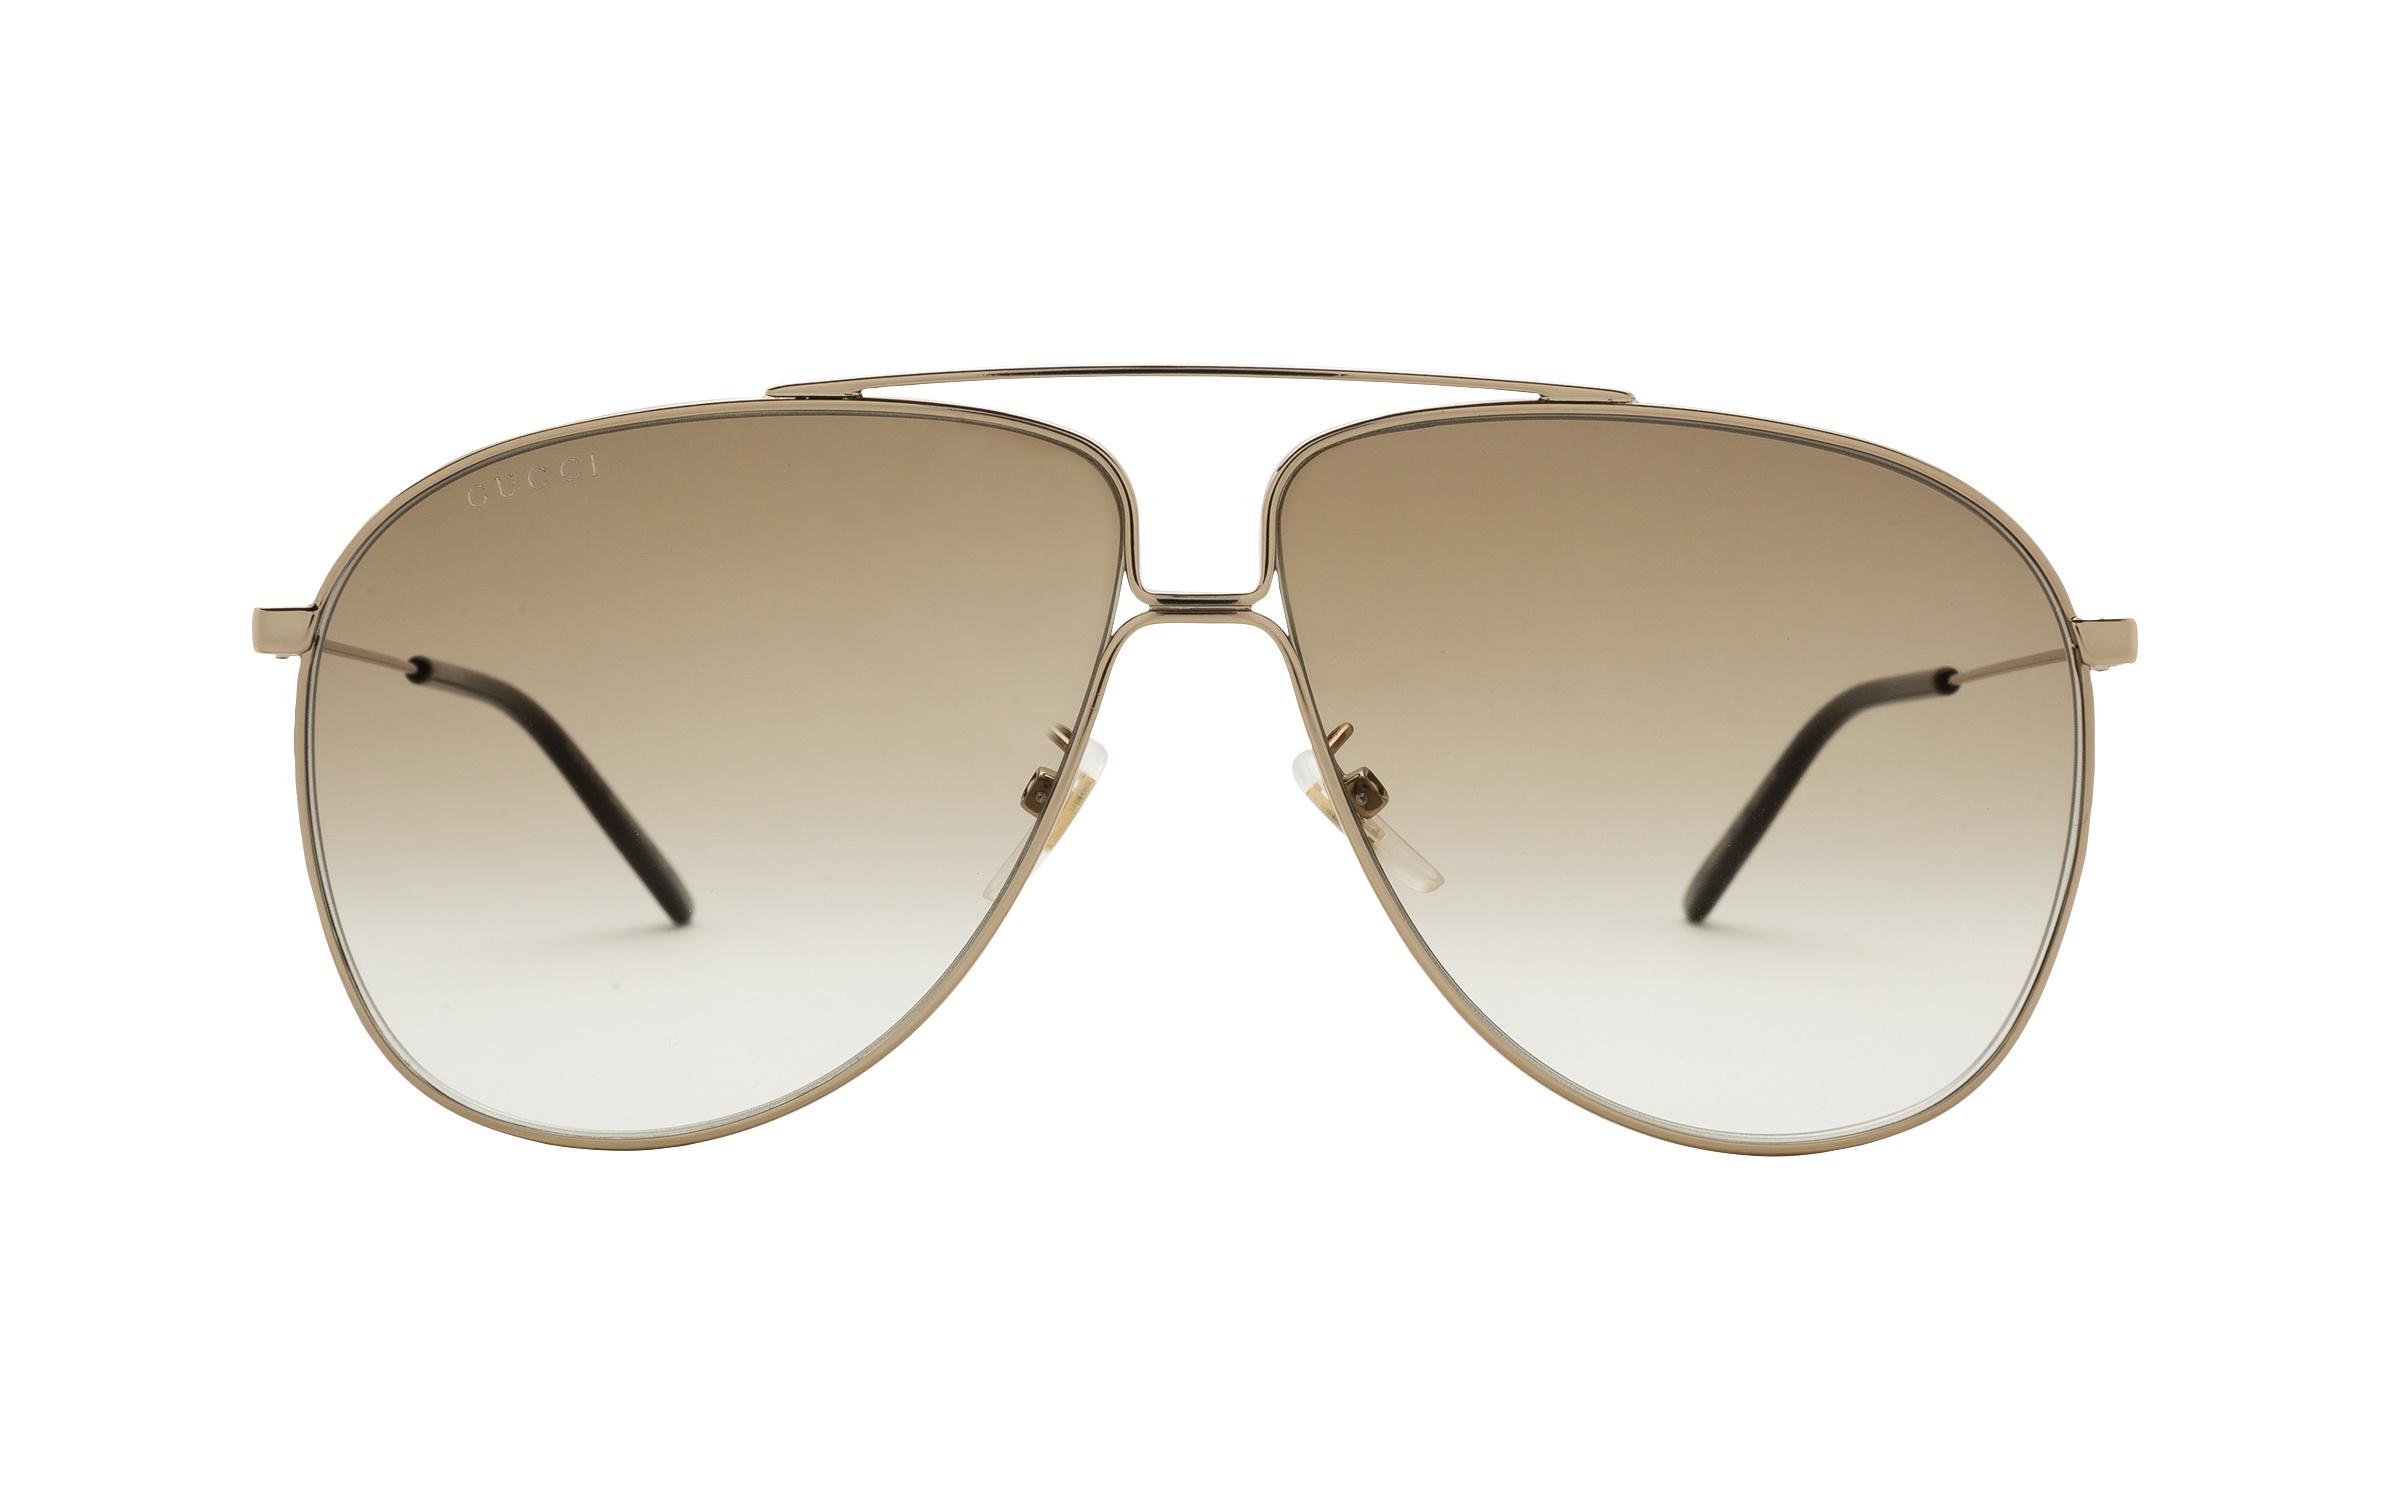 http://www.coastal.com/ - Gucci GG0440S 007 63 Sunglasses in Gold | Acetate – Online Coastal